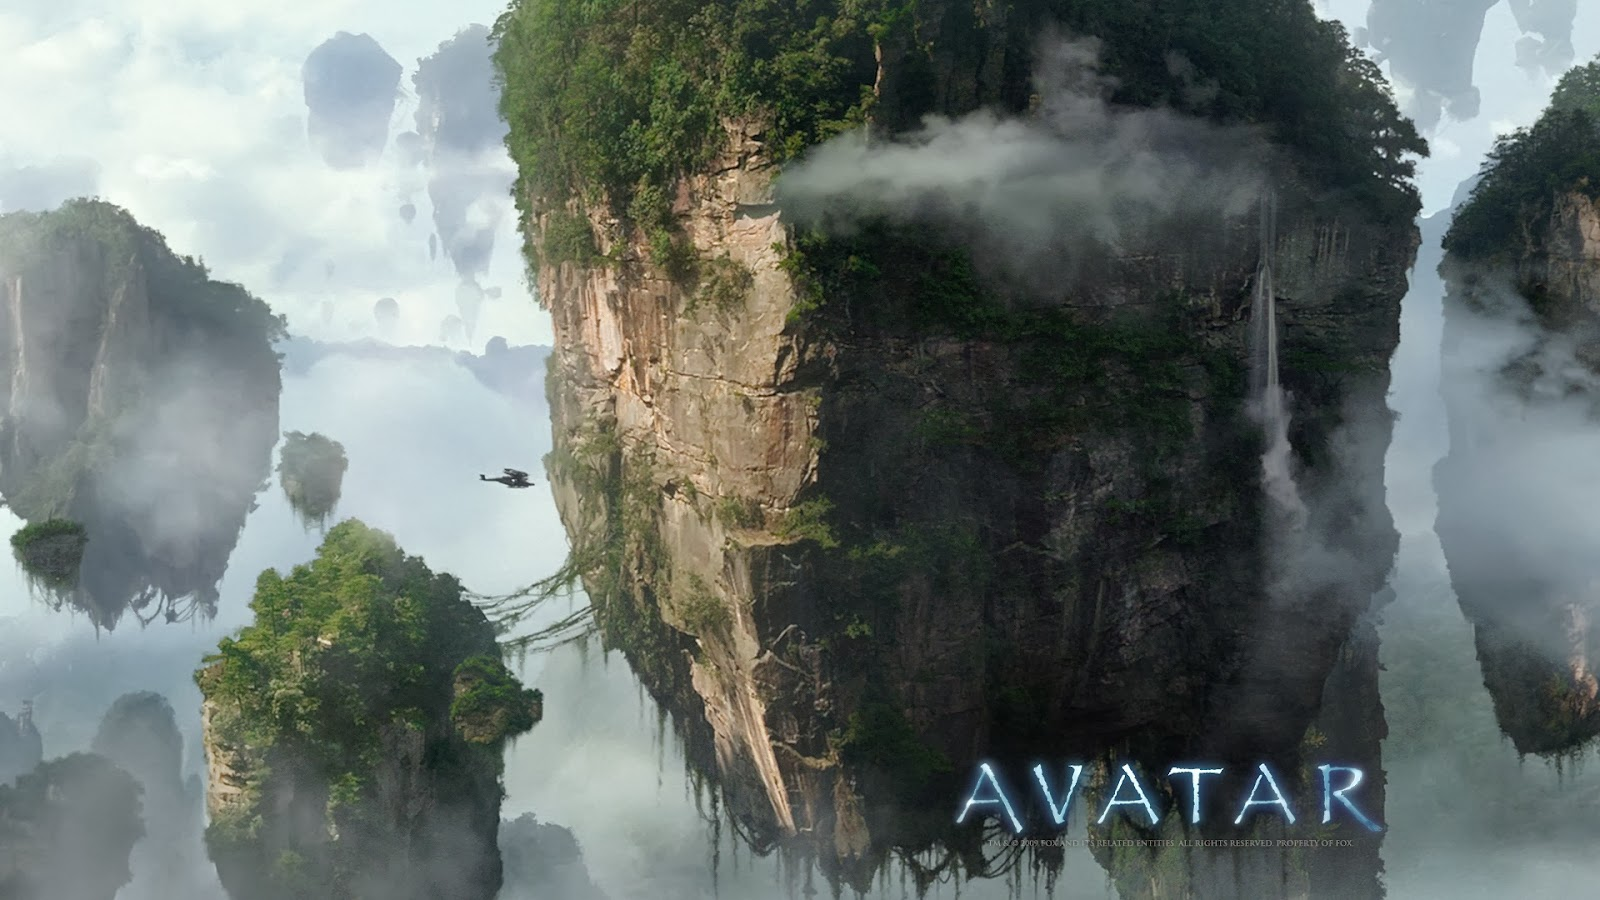 human vs navi battle pandora avatar wallpapers - Avatar Human Vs Navi Battle Pandora Wallpaper